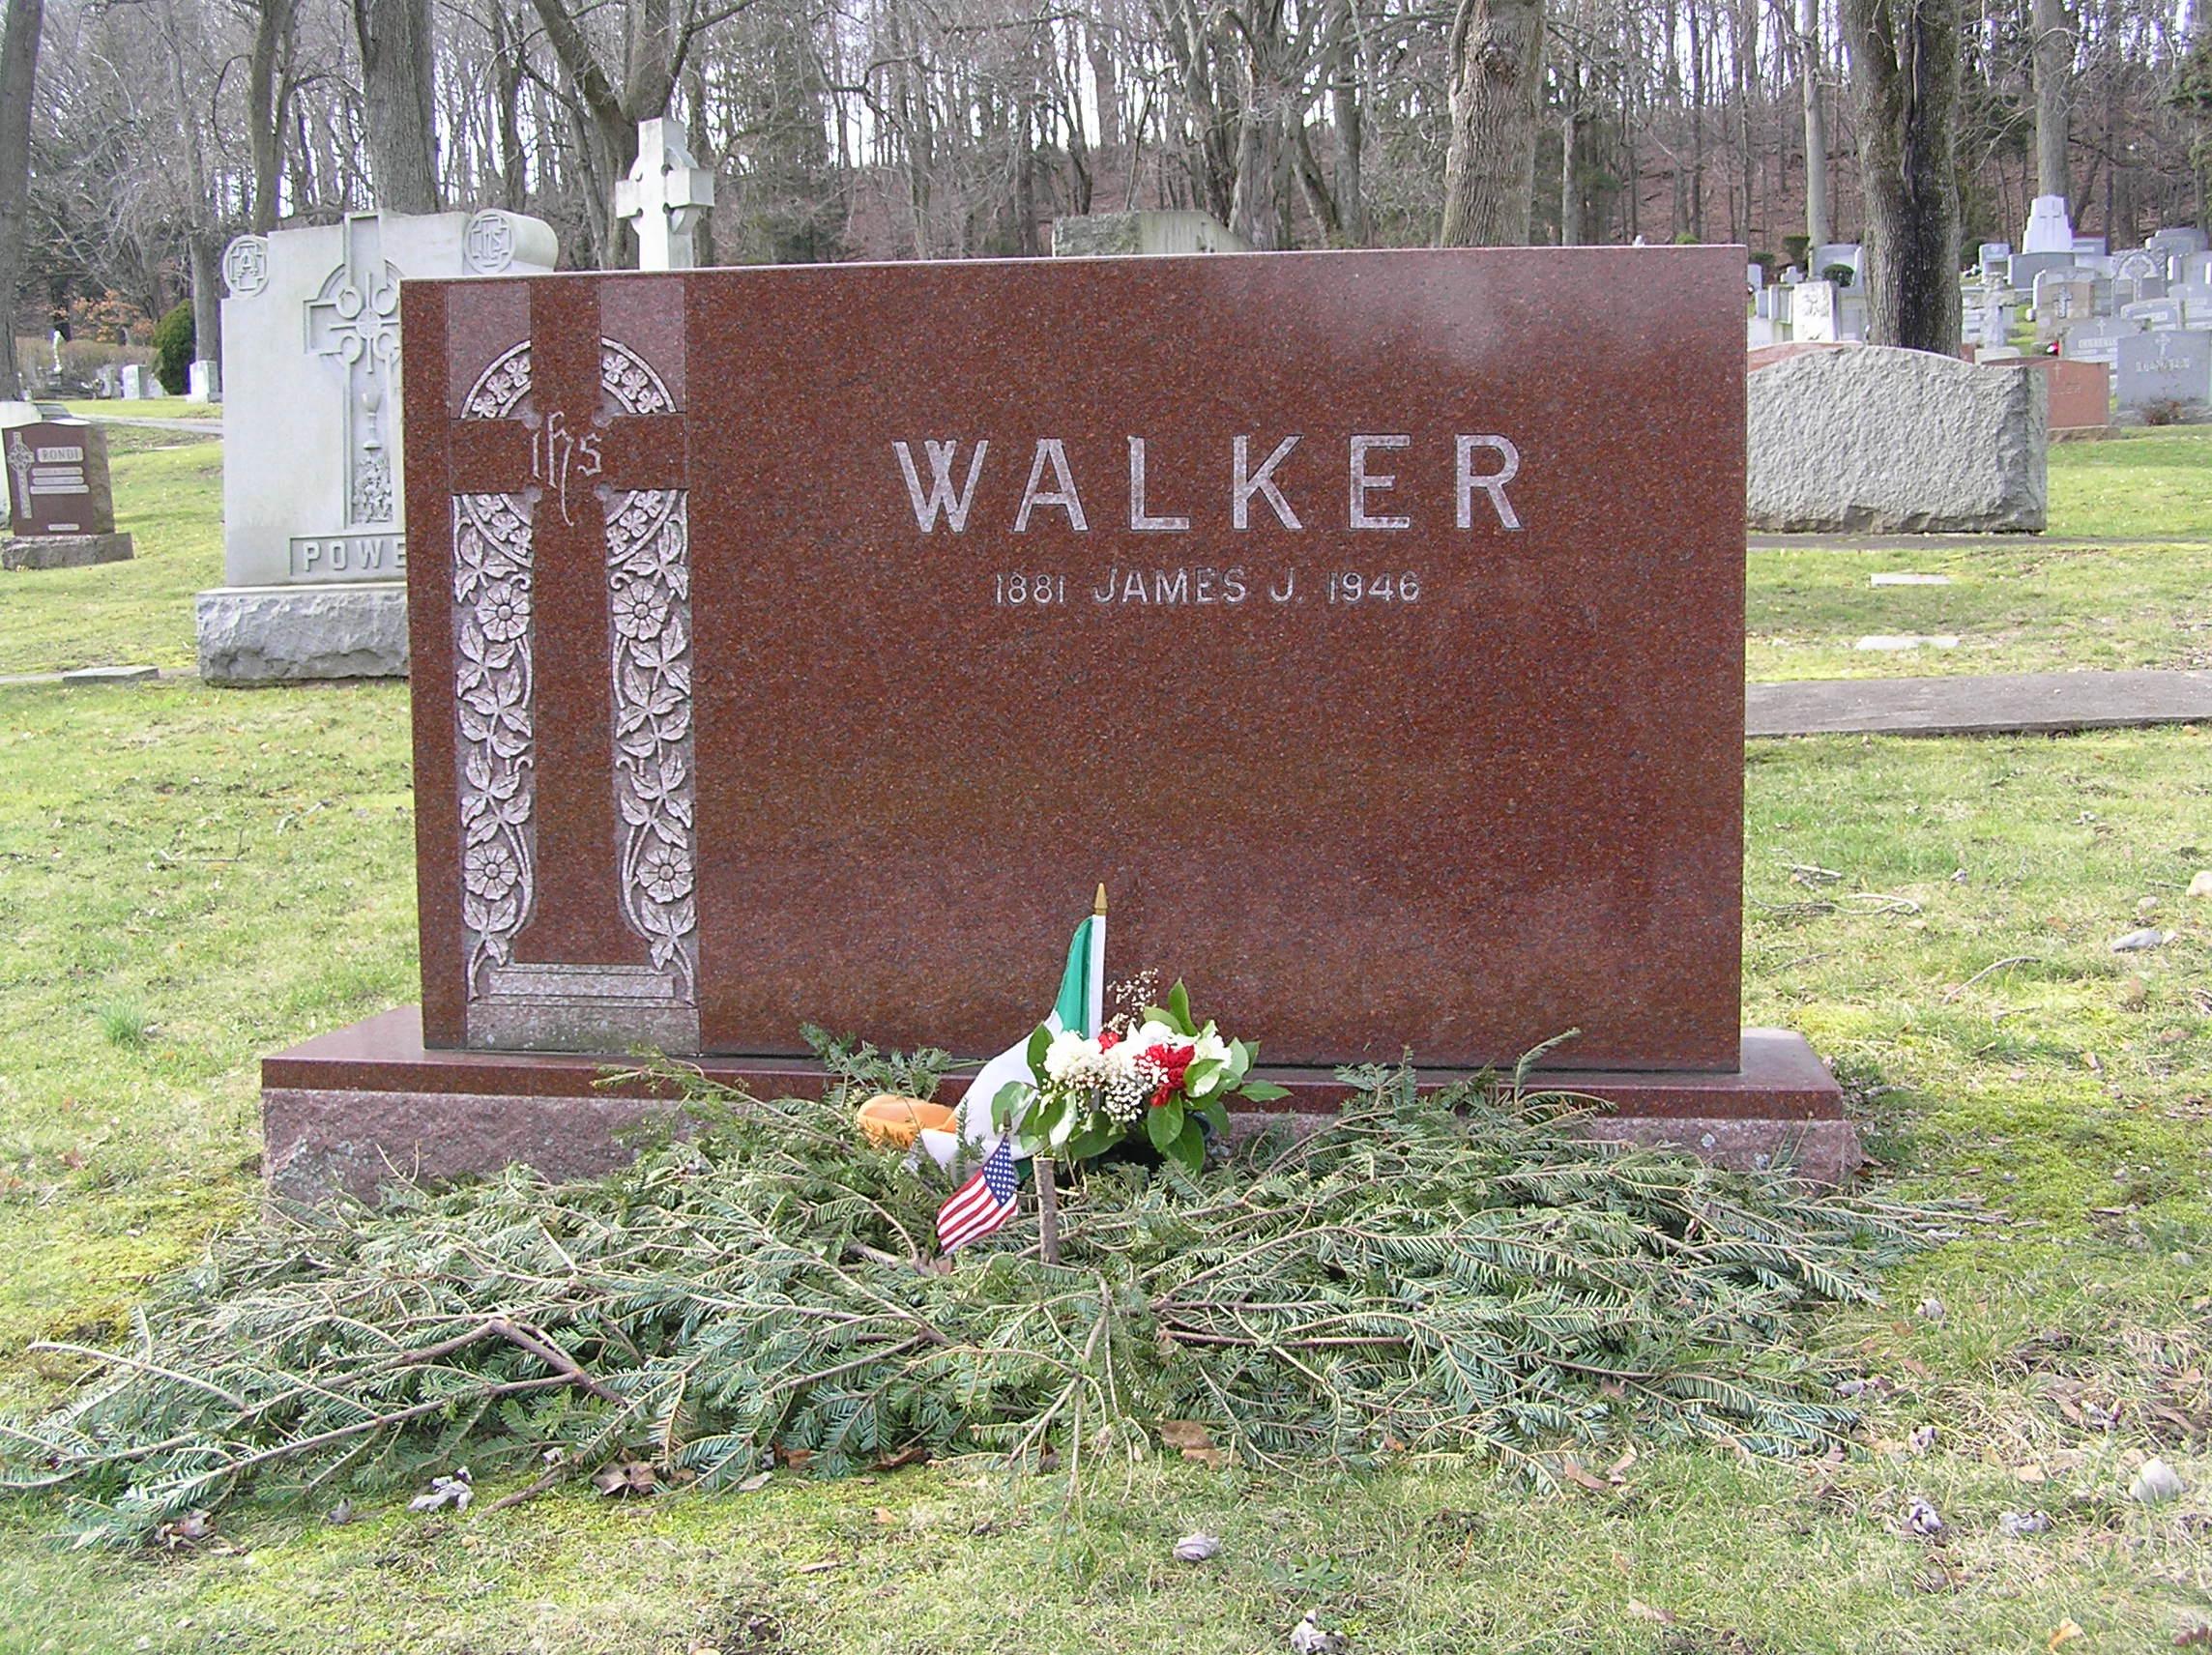 The grave of Jimmy Walker in Gate of Heaven Cemetery